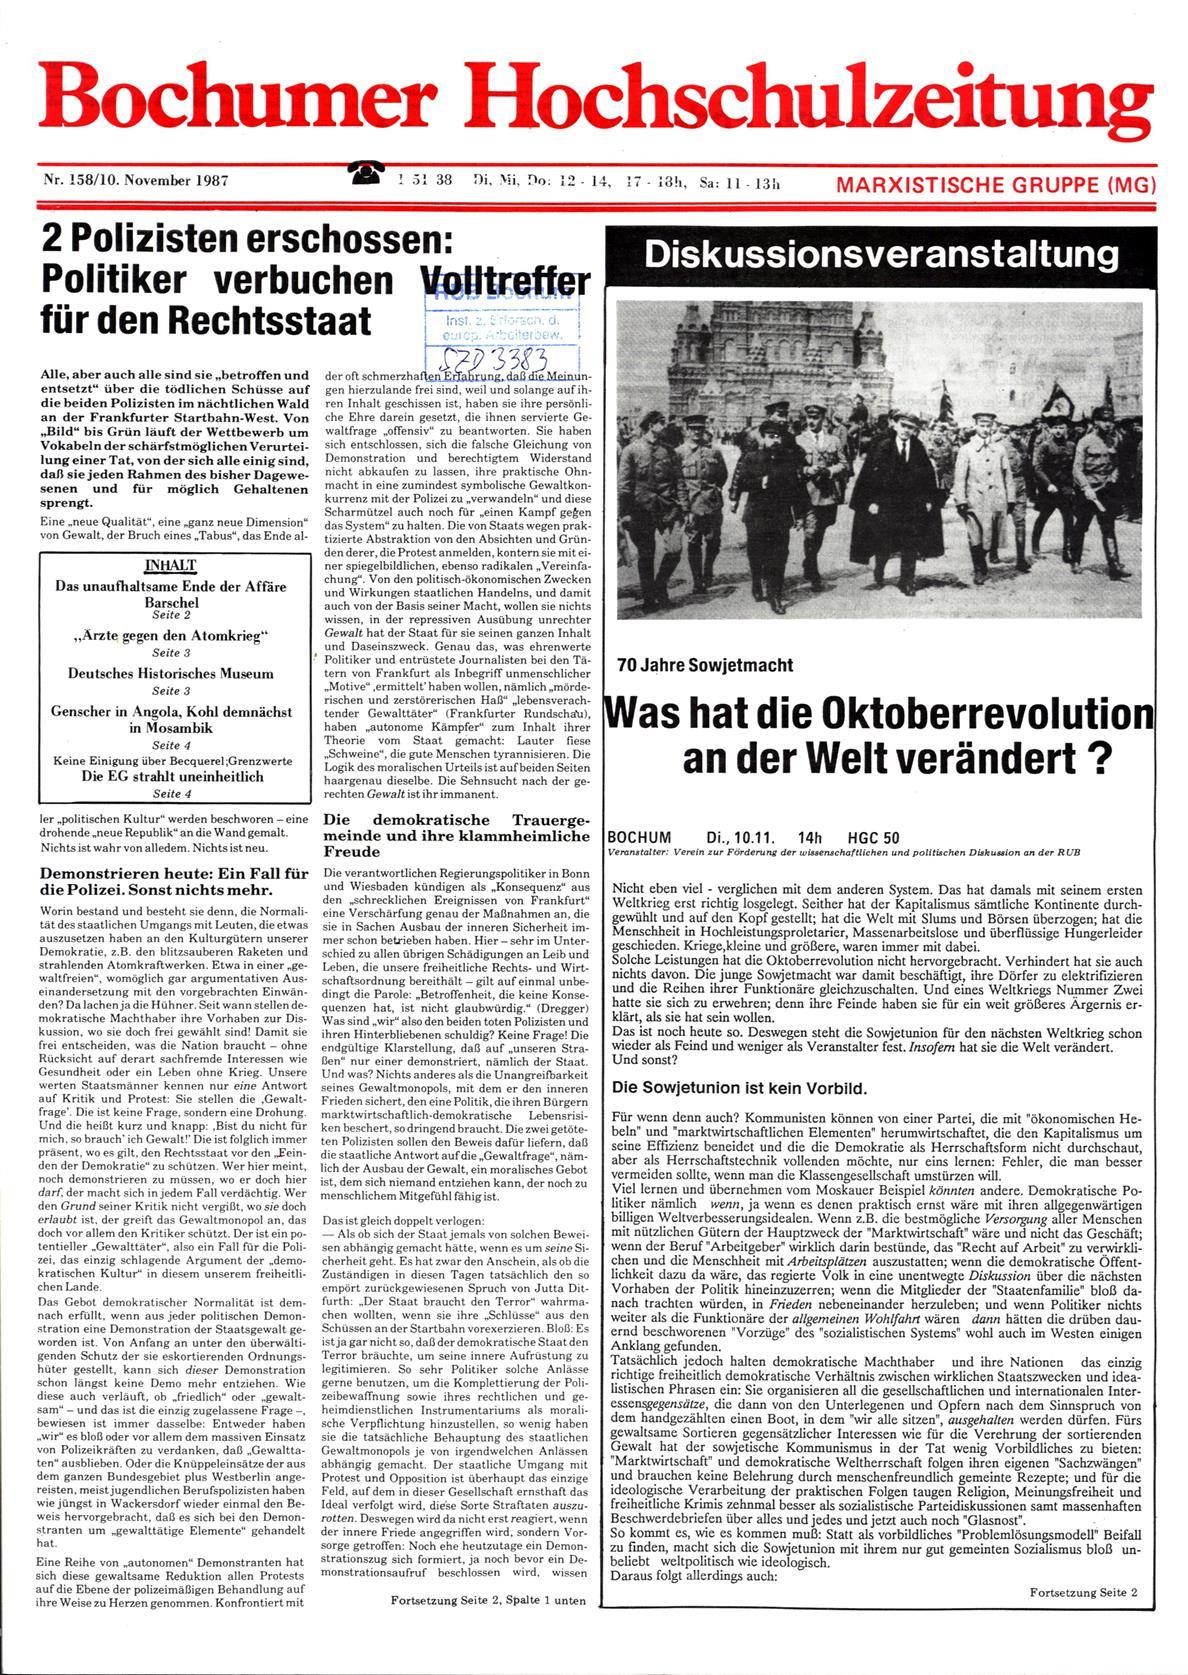 Bochum_BHZ_19871110_158_001